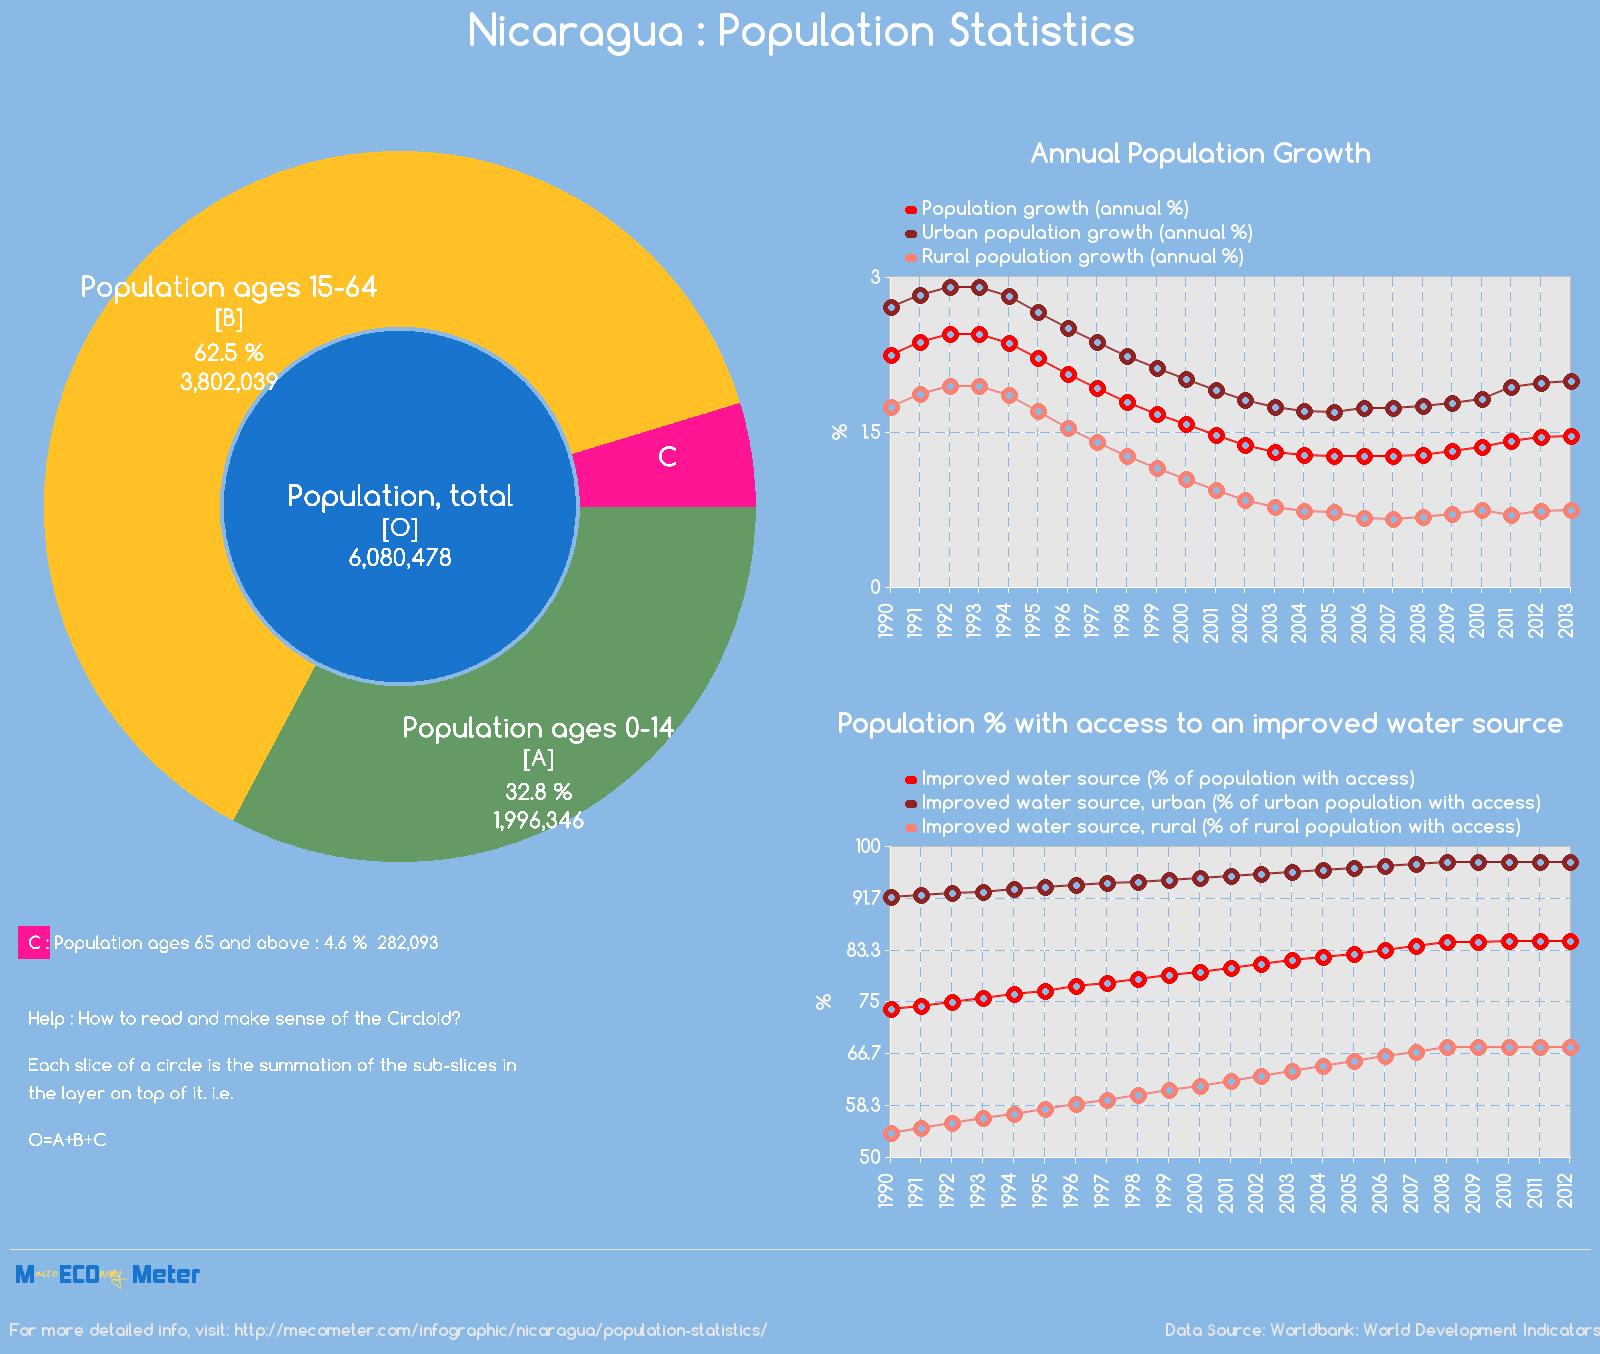 Nicaragua : Population Statistics